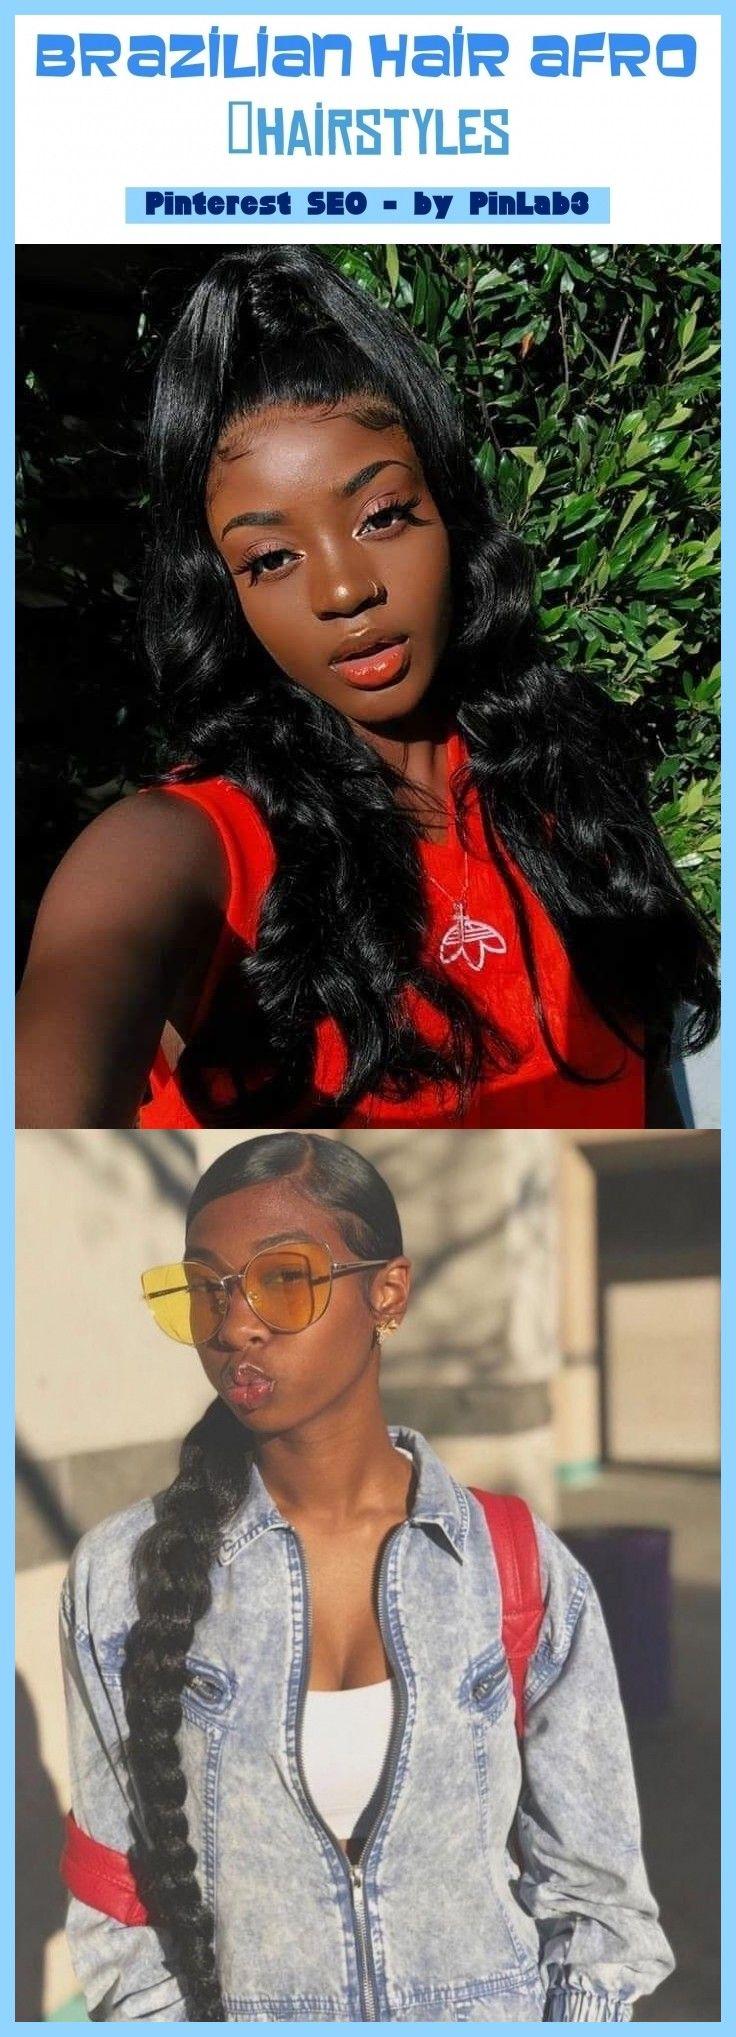 brazilian hair afro brazilian hair sew in, brazilian hair weave, brazilian hair bundles, brazilian